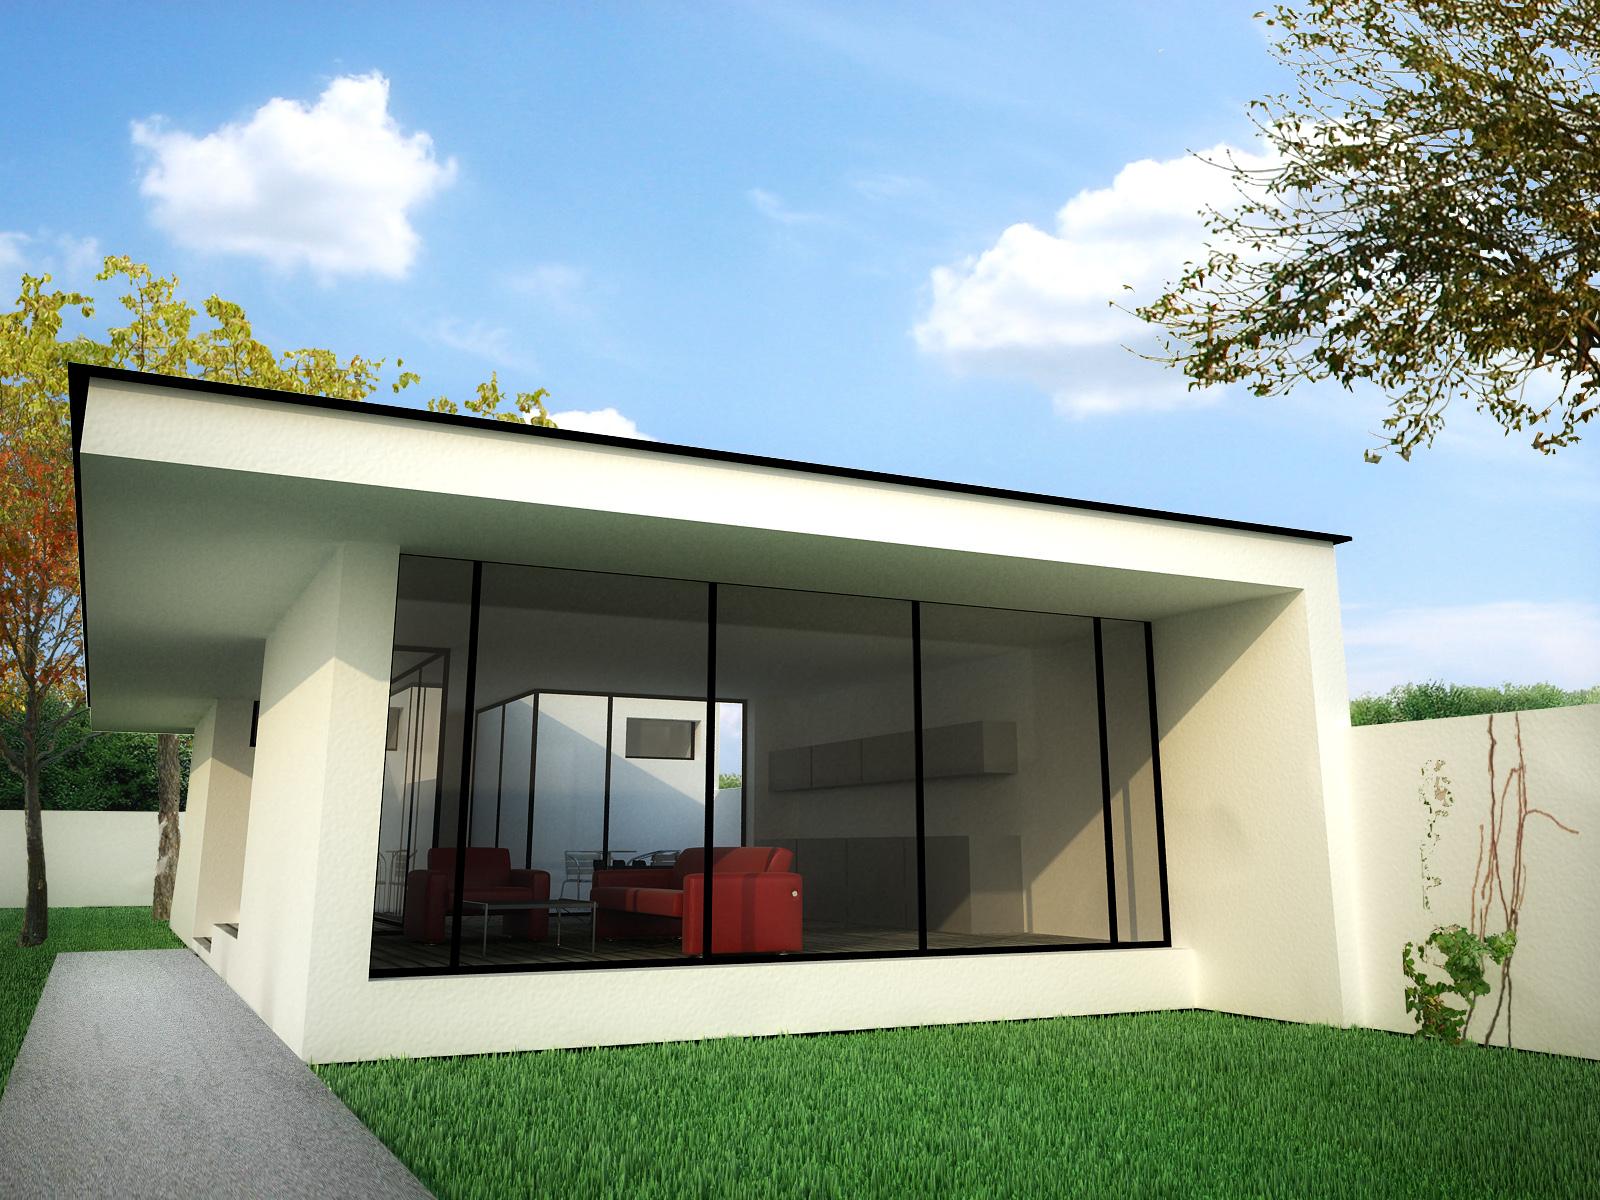 Proiecte de case moderne casa i gr dina - Moderne fotos ...